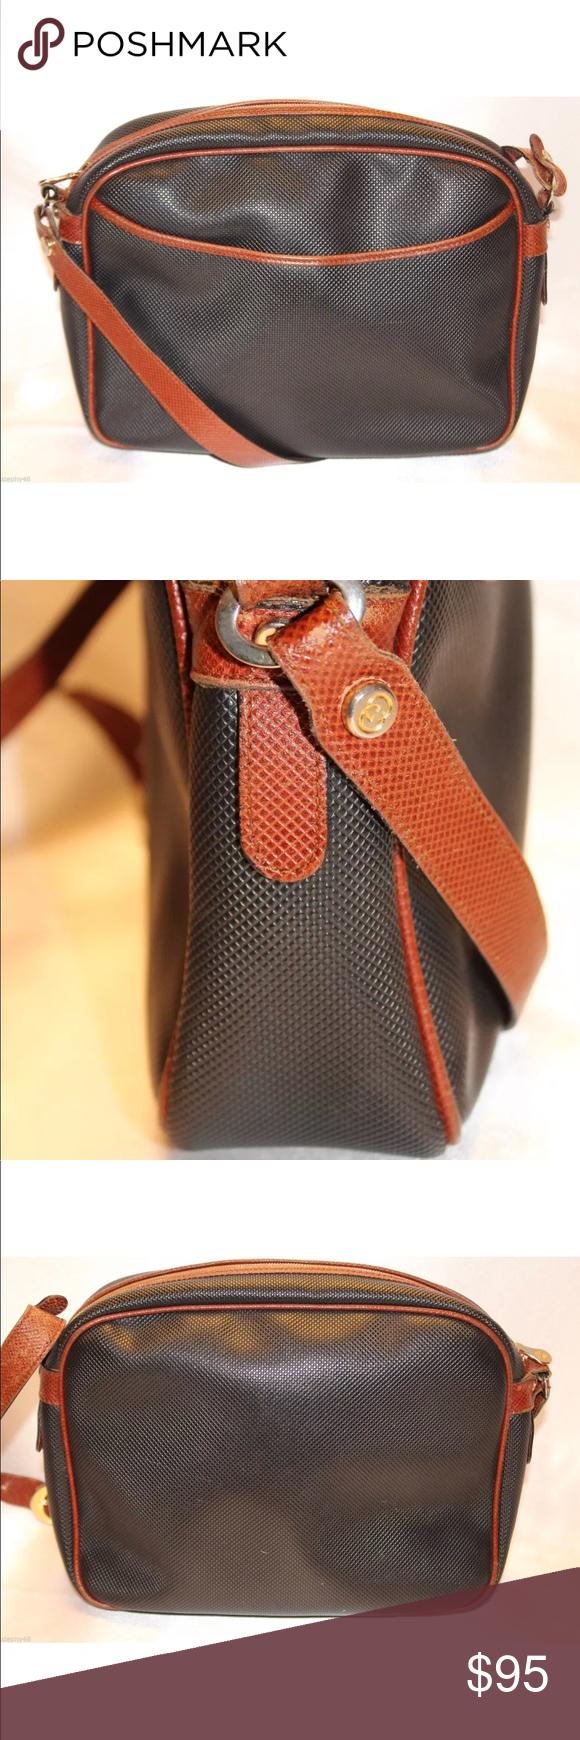 Bottega veneta Leather Crossbody bag Italy Style  Marco polo b8be513af2e1e